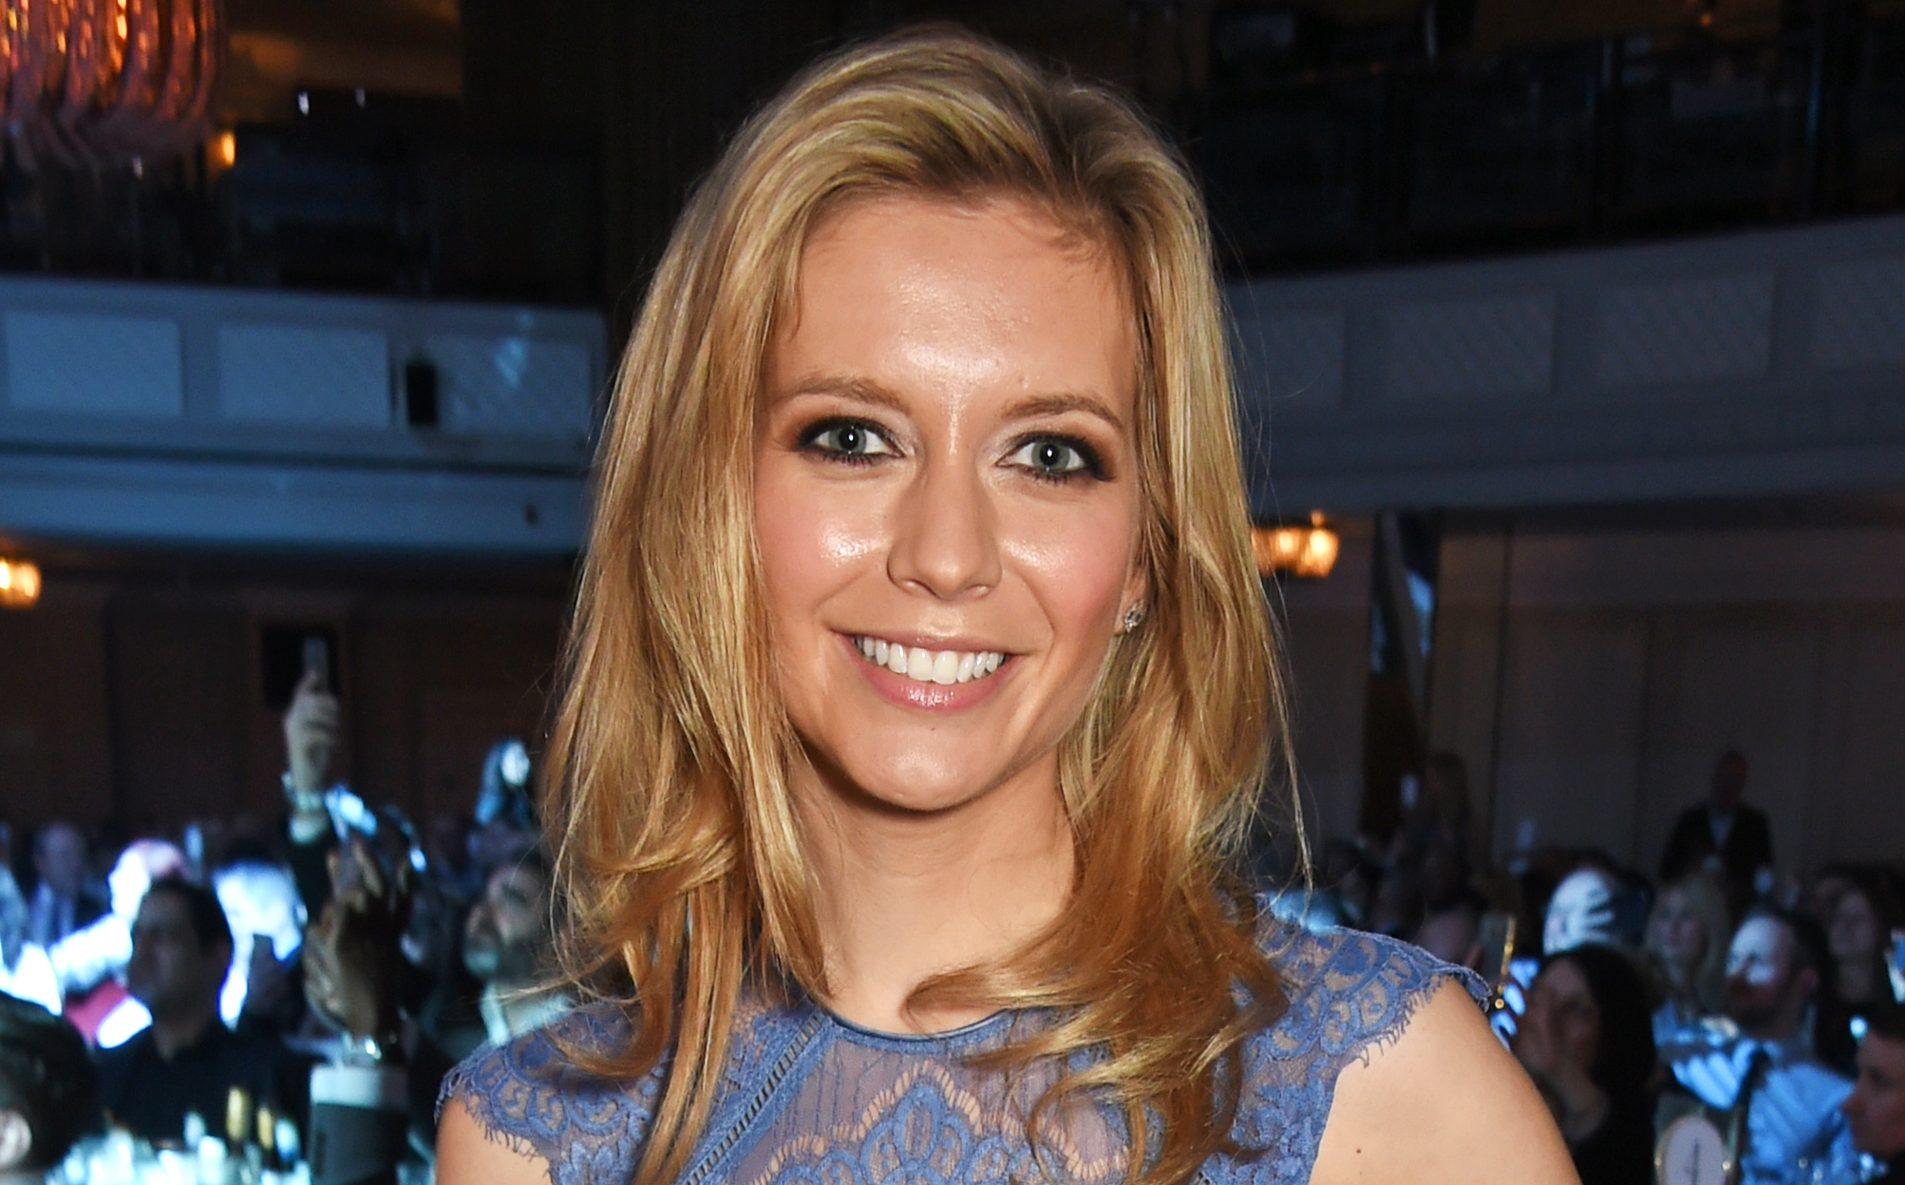 Rachel Riley hits back at 'hideous abuse' after calling Tottenham's defeat to West Ham a 'proper bottle job'